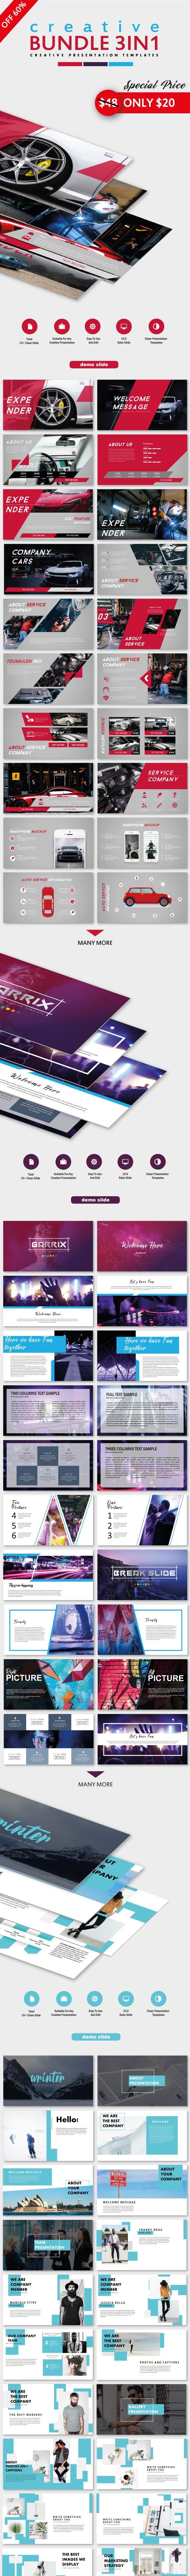 Special Creative Bundle 3 IN 1 Keynote Templates - Creative Keynote Templates